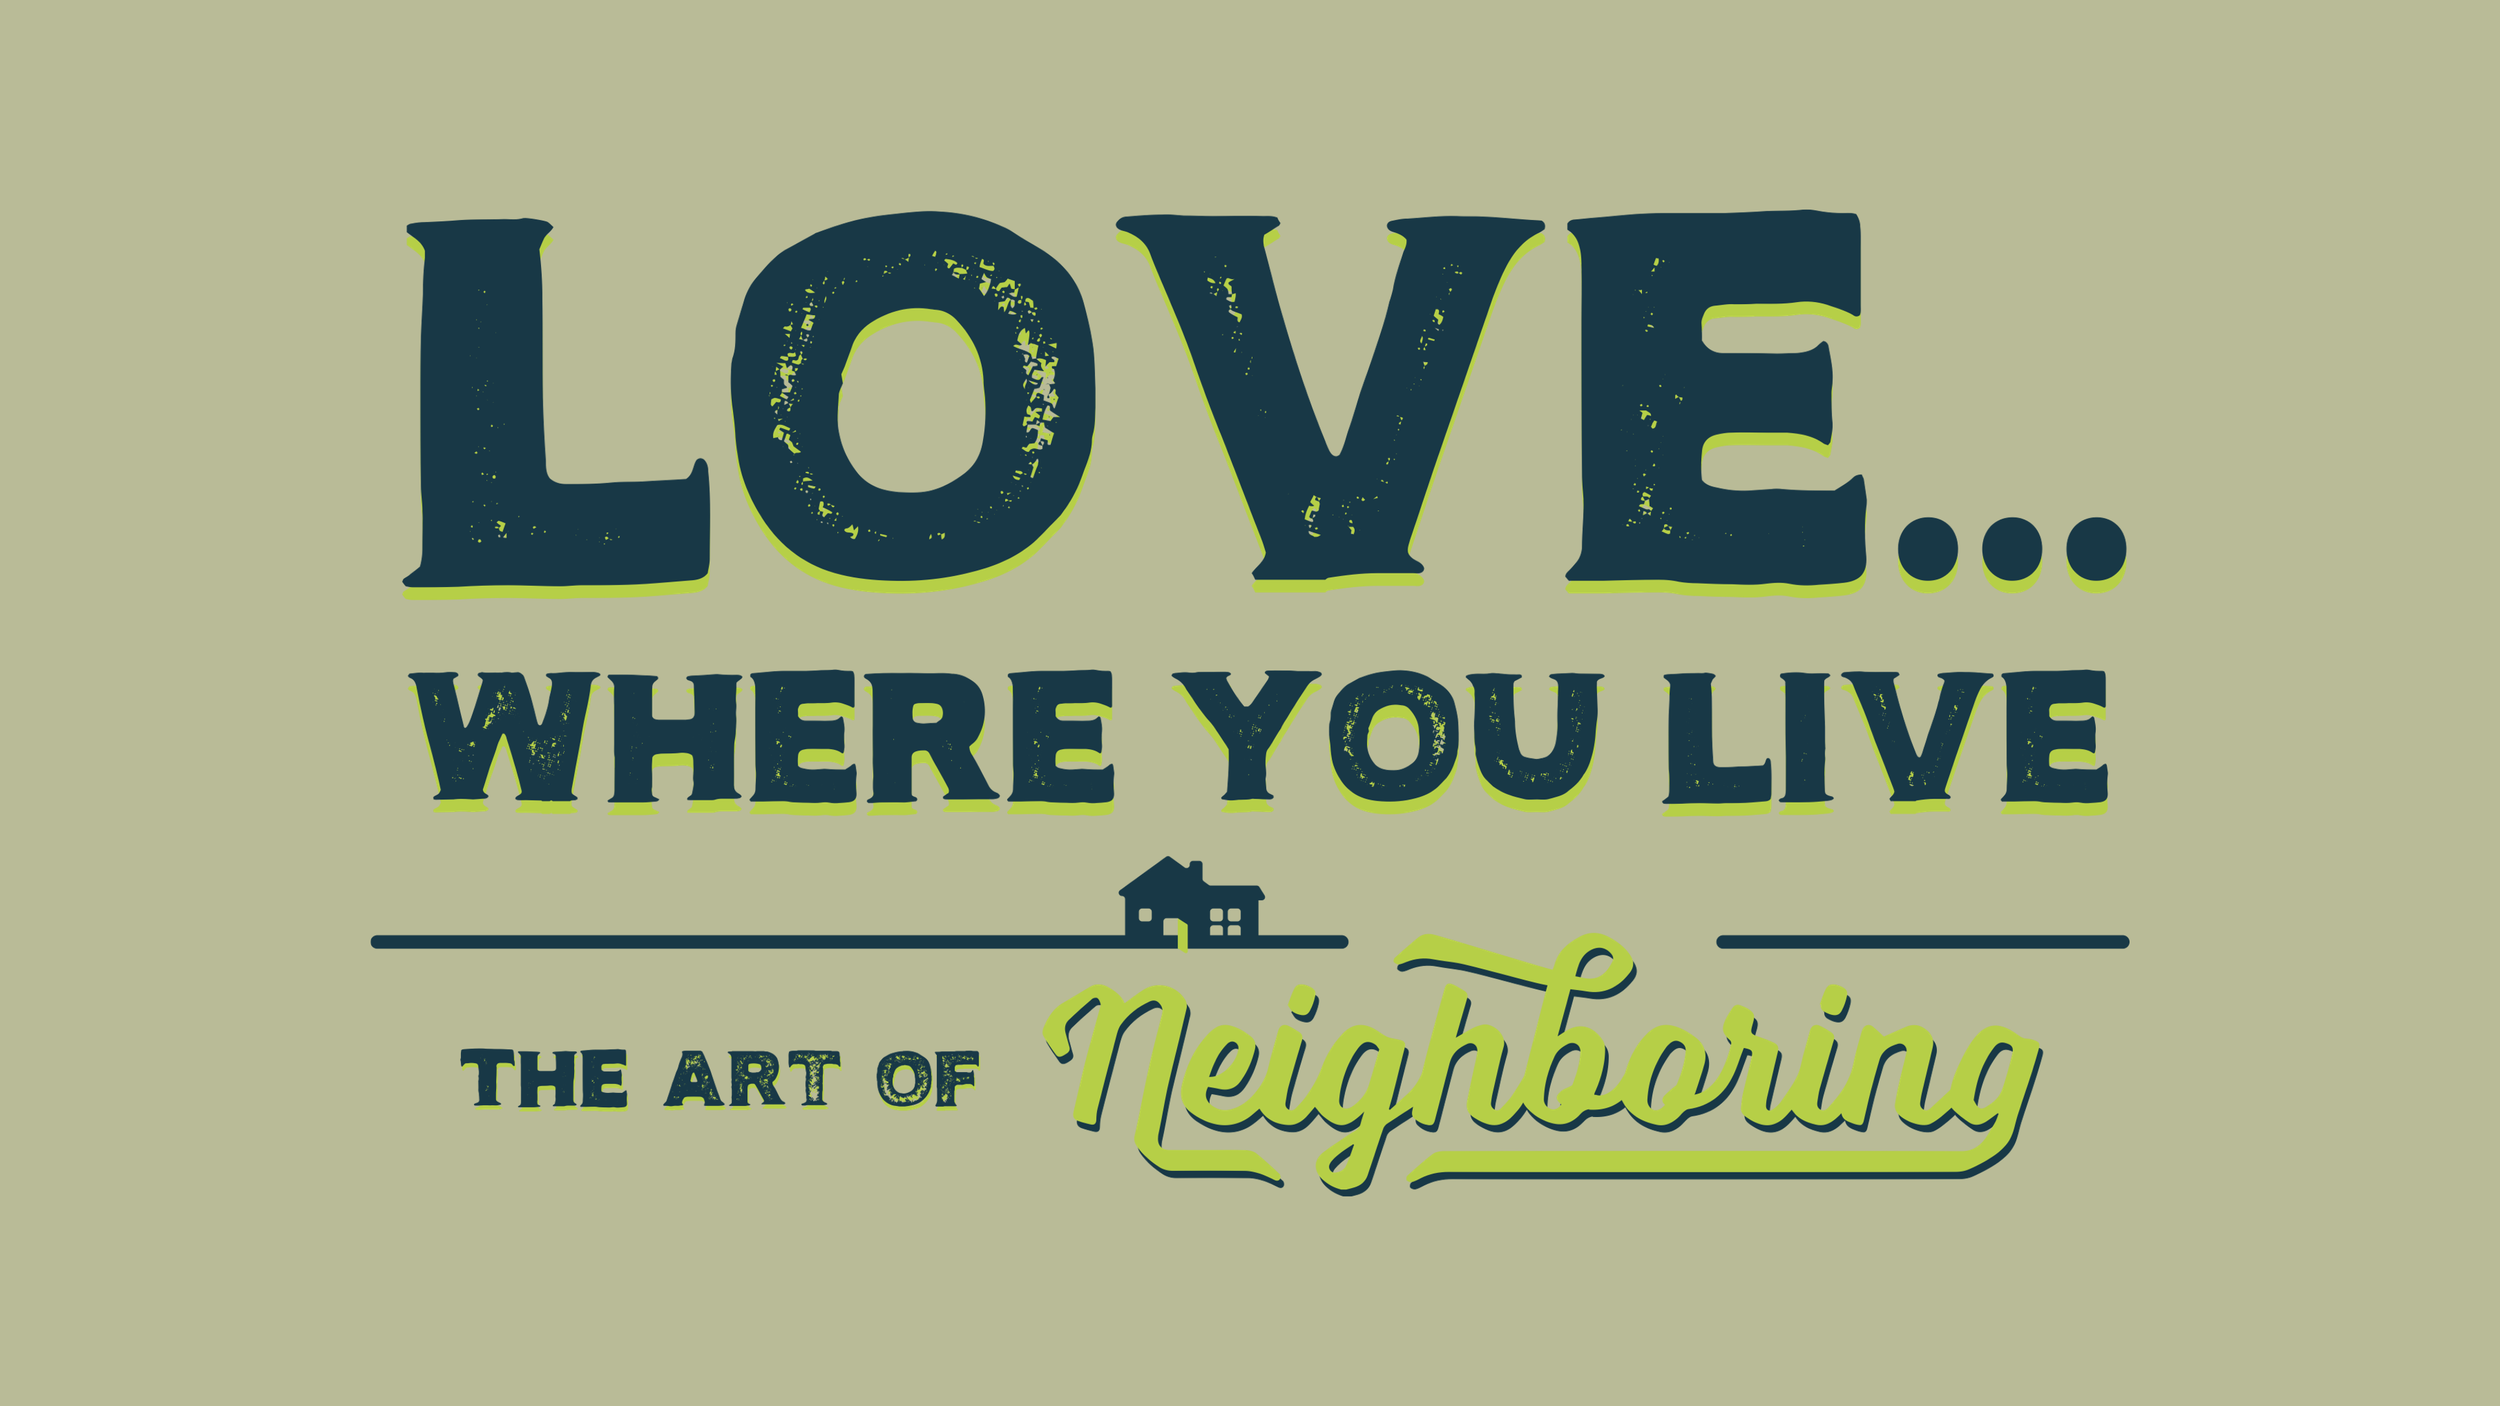 Art of Neighboring (1920x1080).png